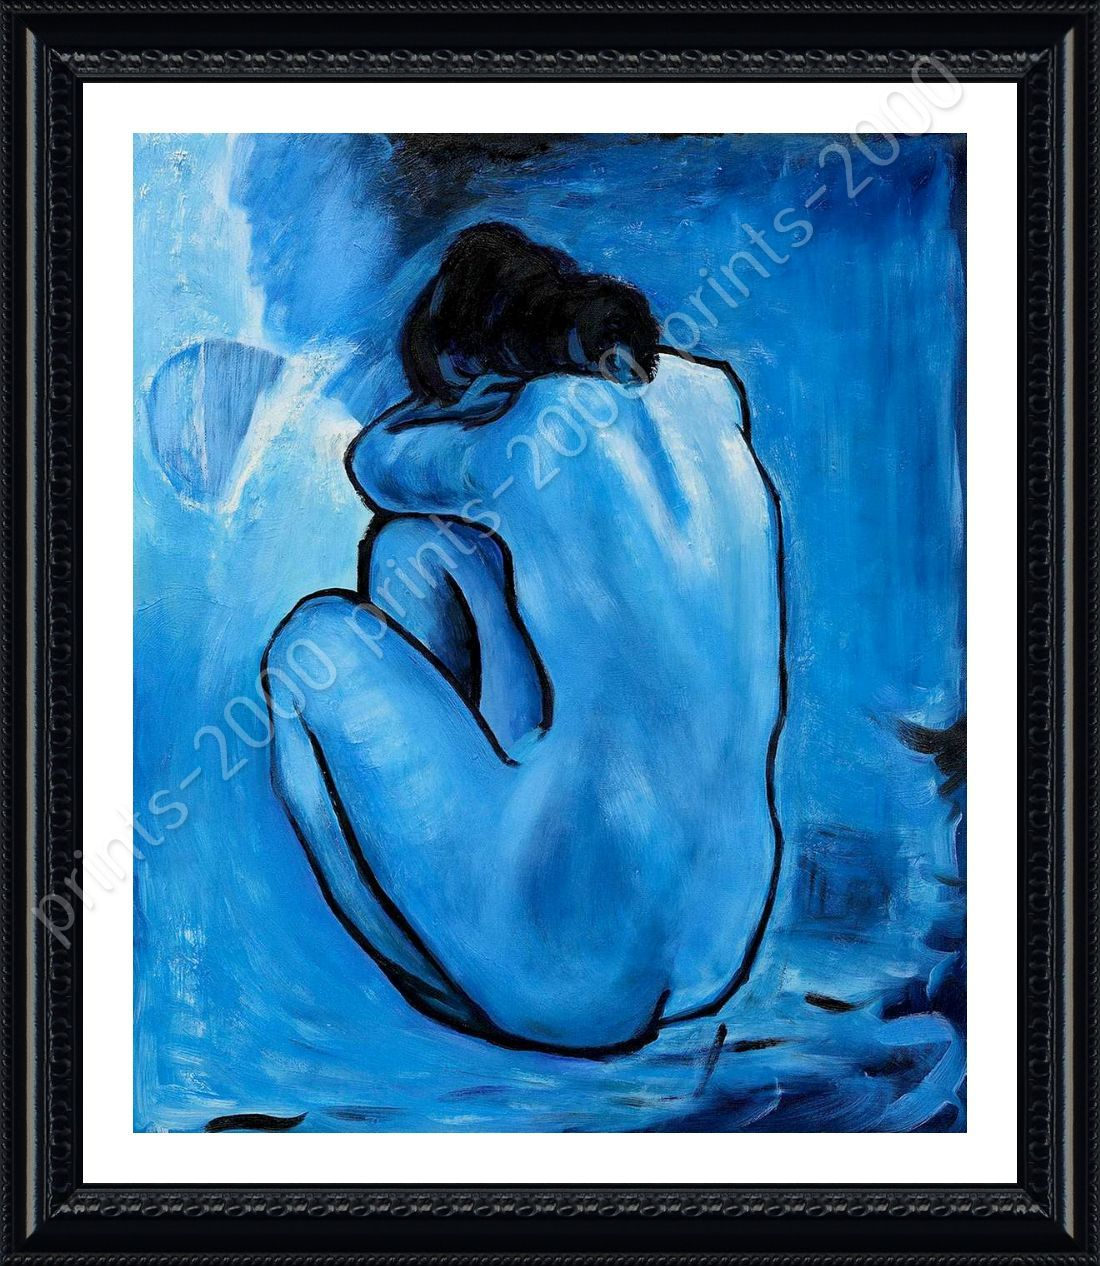 FRAMED Poster Blue Nude Pablo Picasso Framed Art Oil Paintings ...